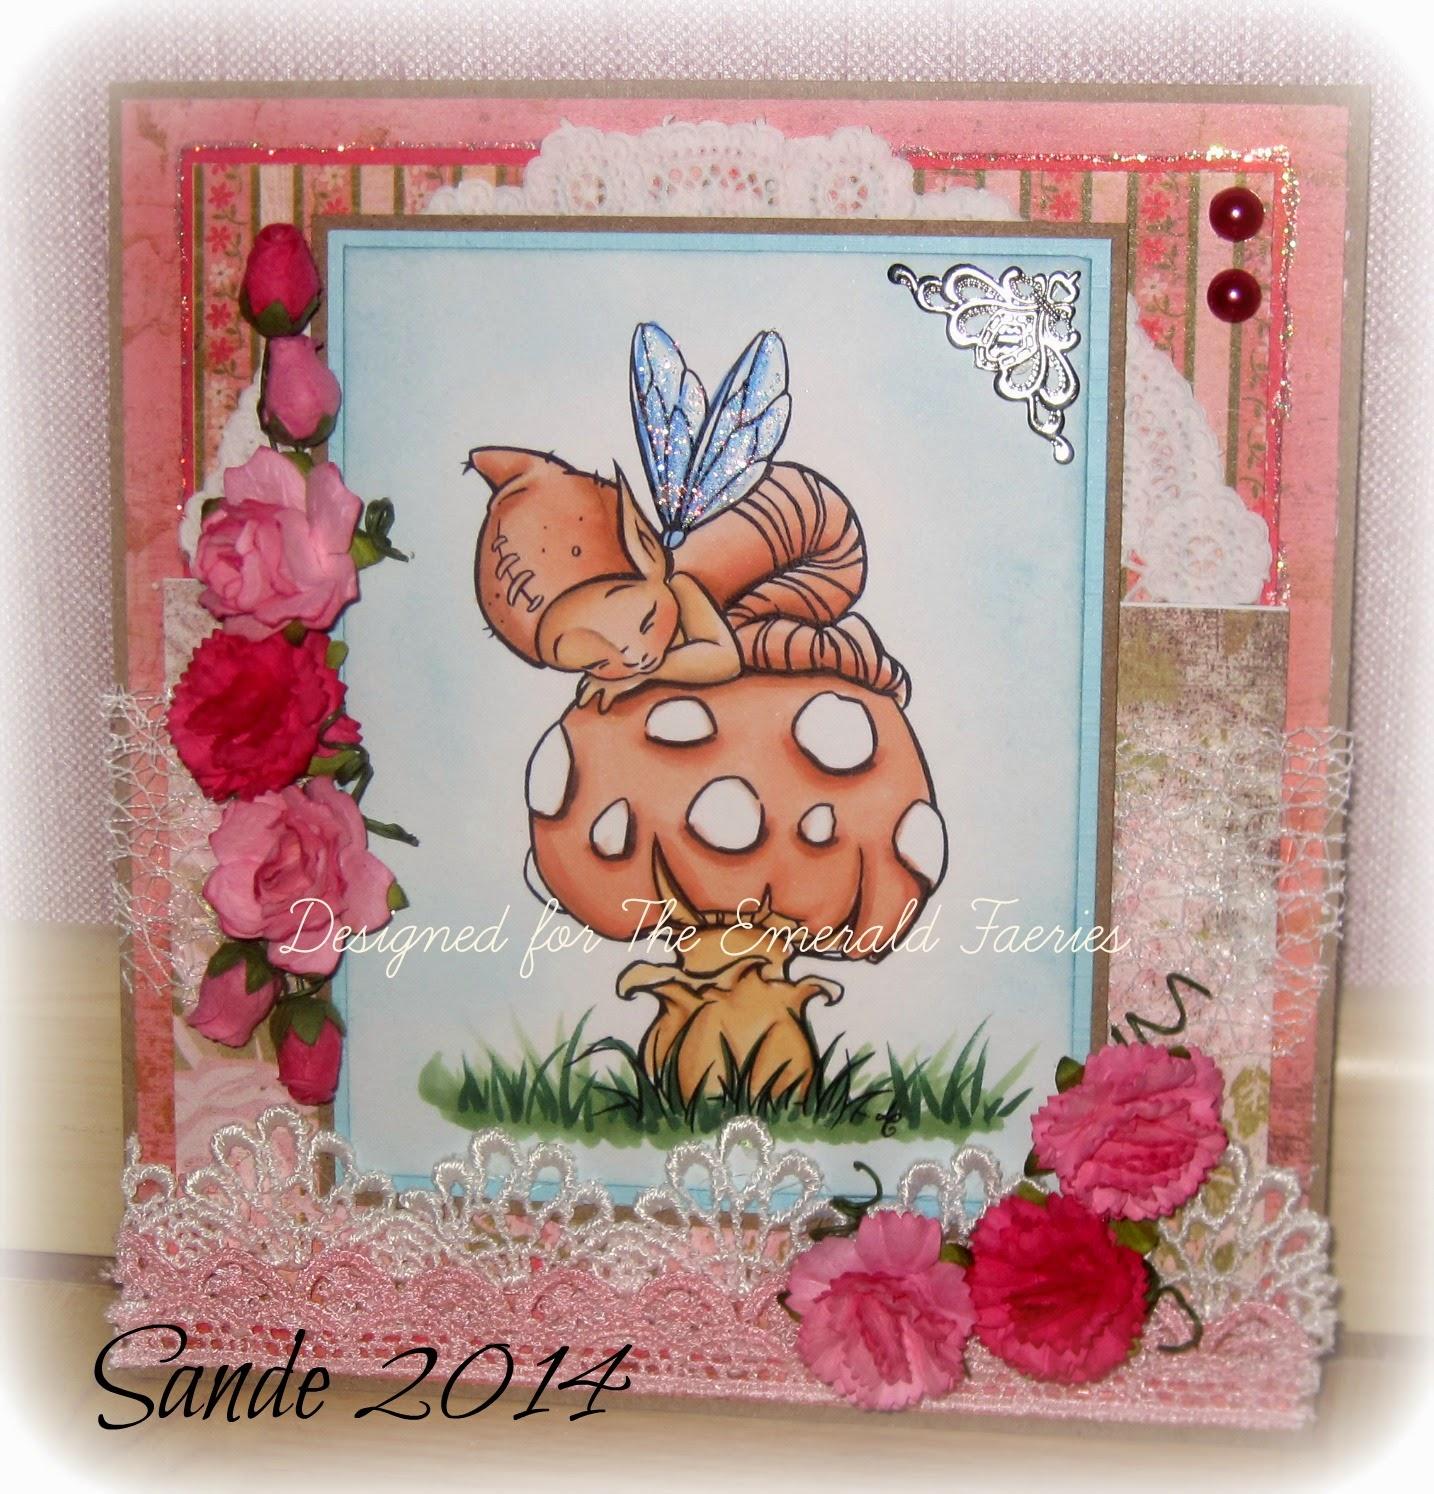 http://3.bp.blogspot.com/-uBlNZ4PXcGw/Uy7jbK1QhoI/AAAAAAAAOLQ/h0czMO8B0xo/s1600/Pretty+in+Pink+Sande+%232.jpg